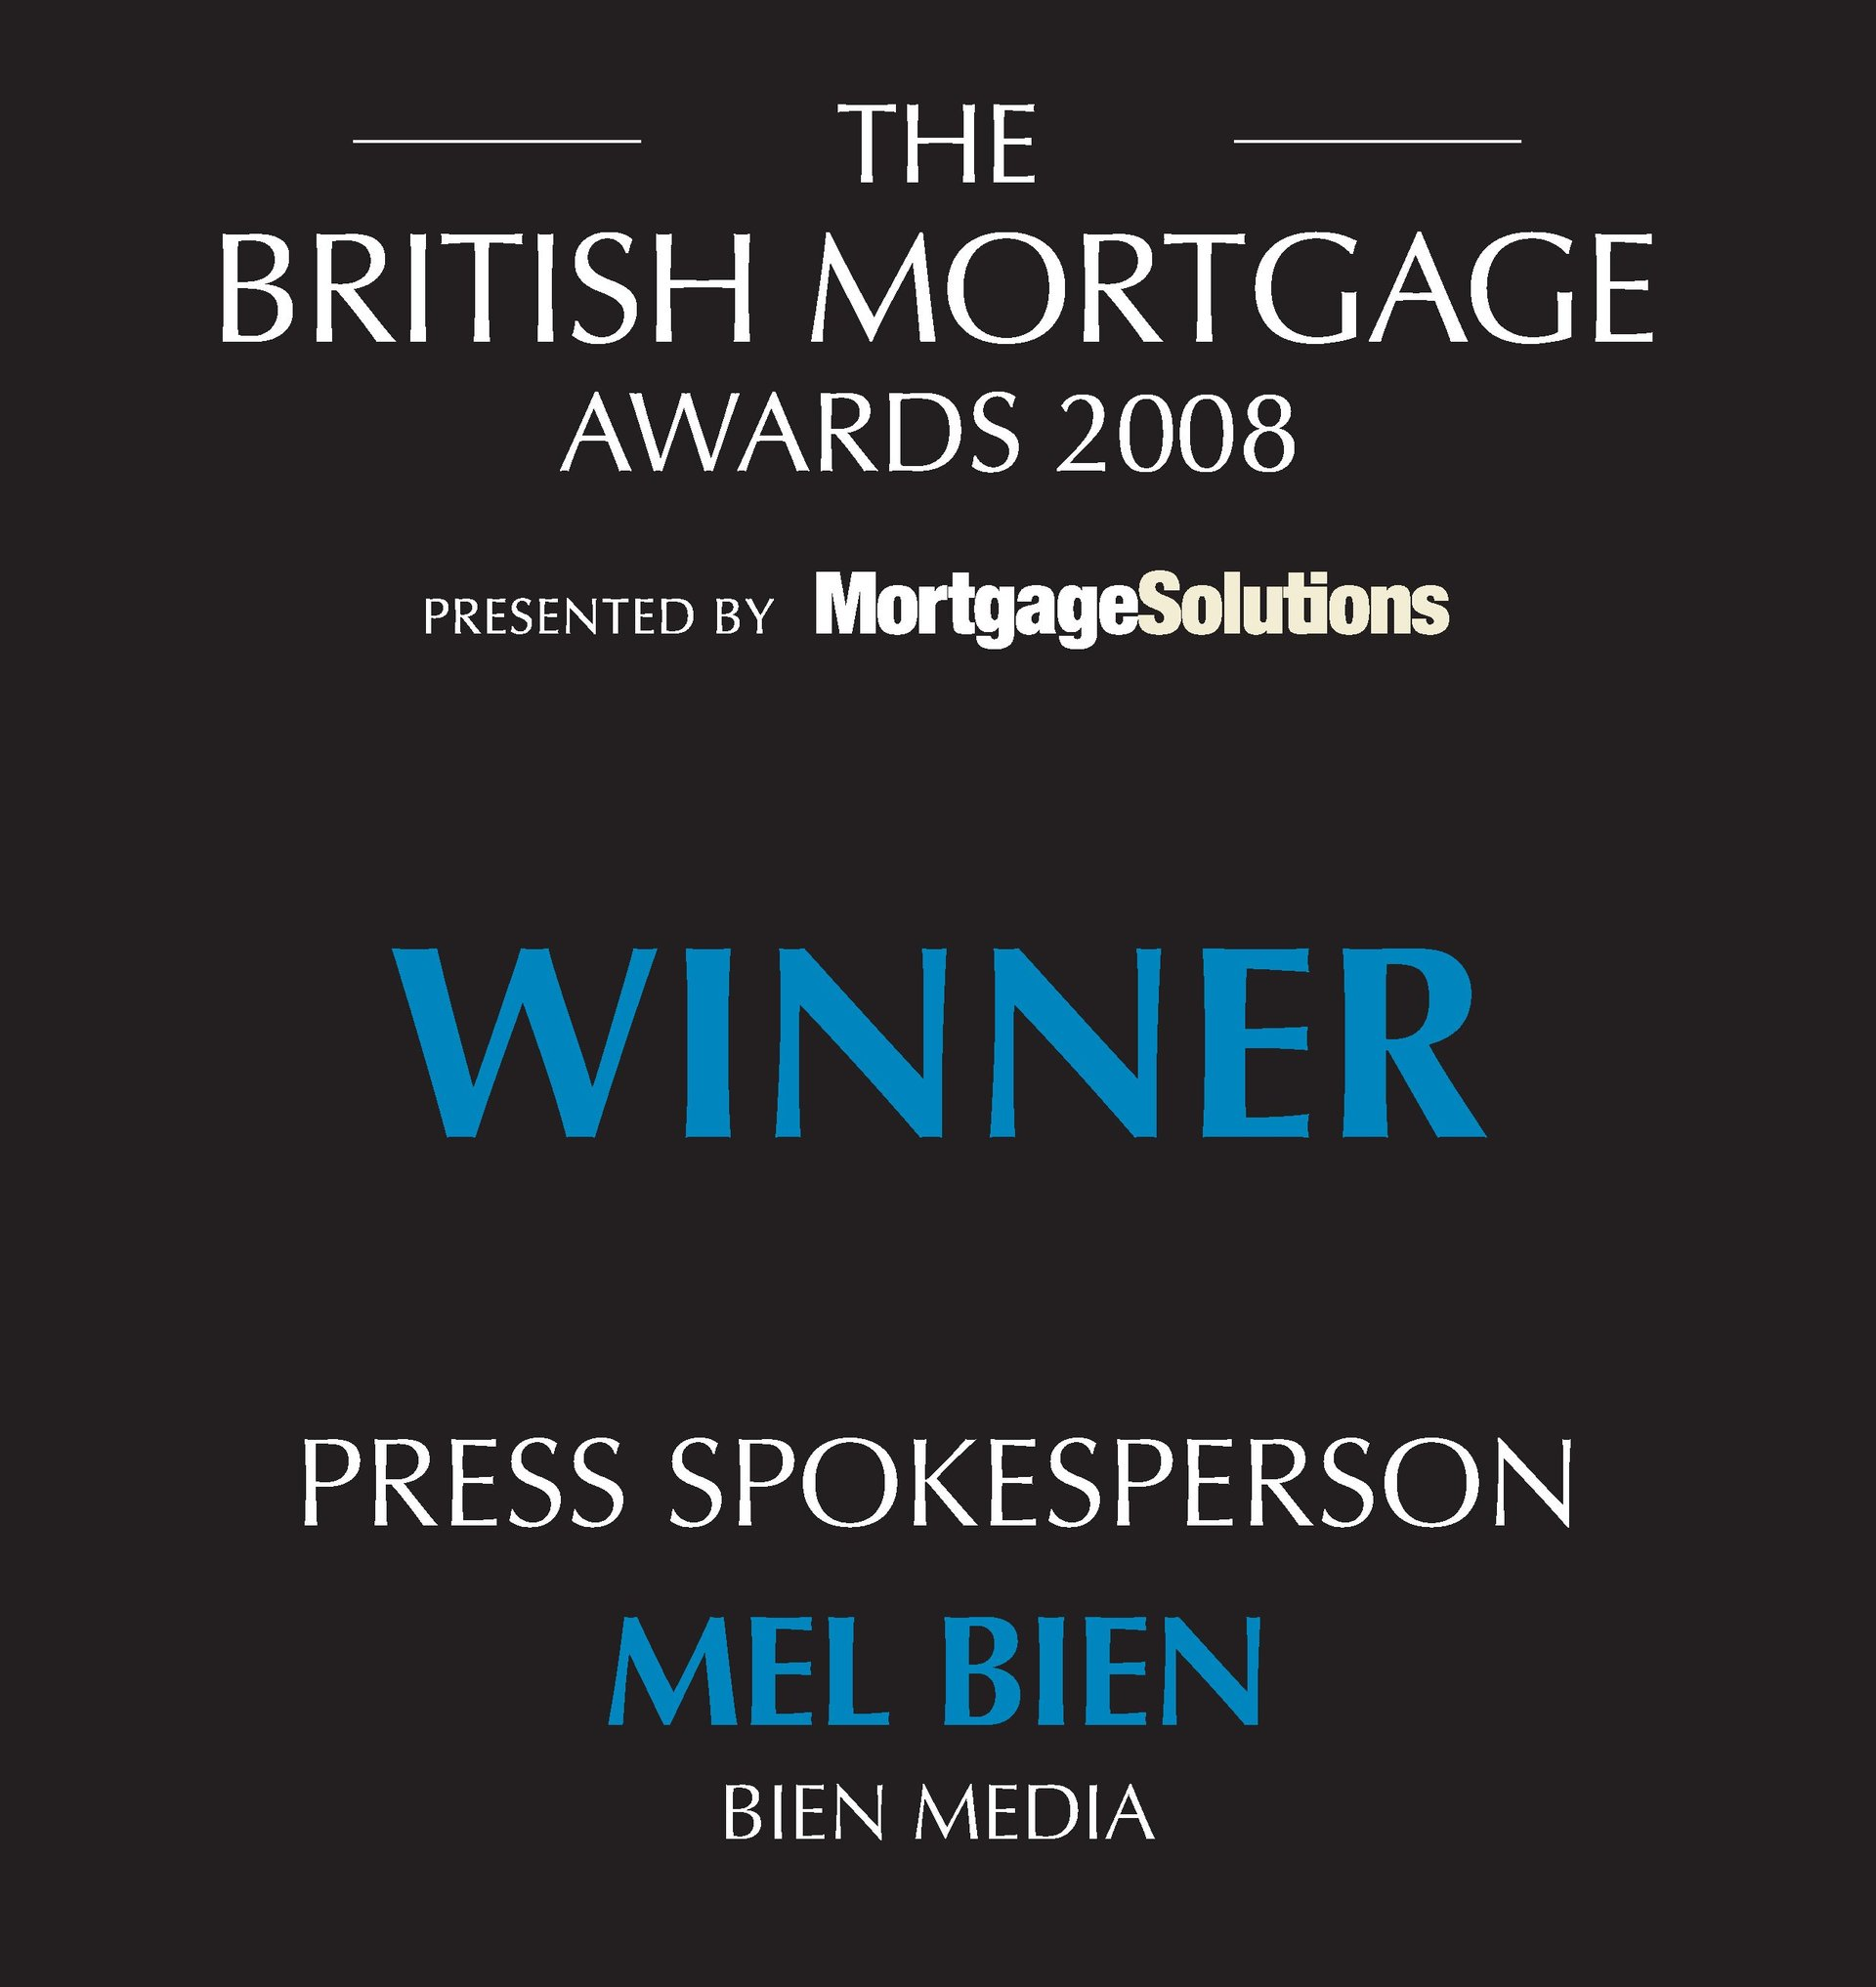 British Mortgage Awards Winner 2008